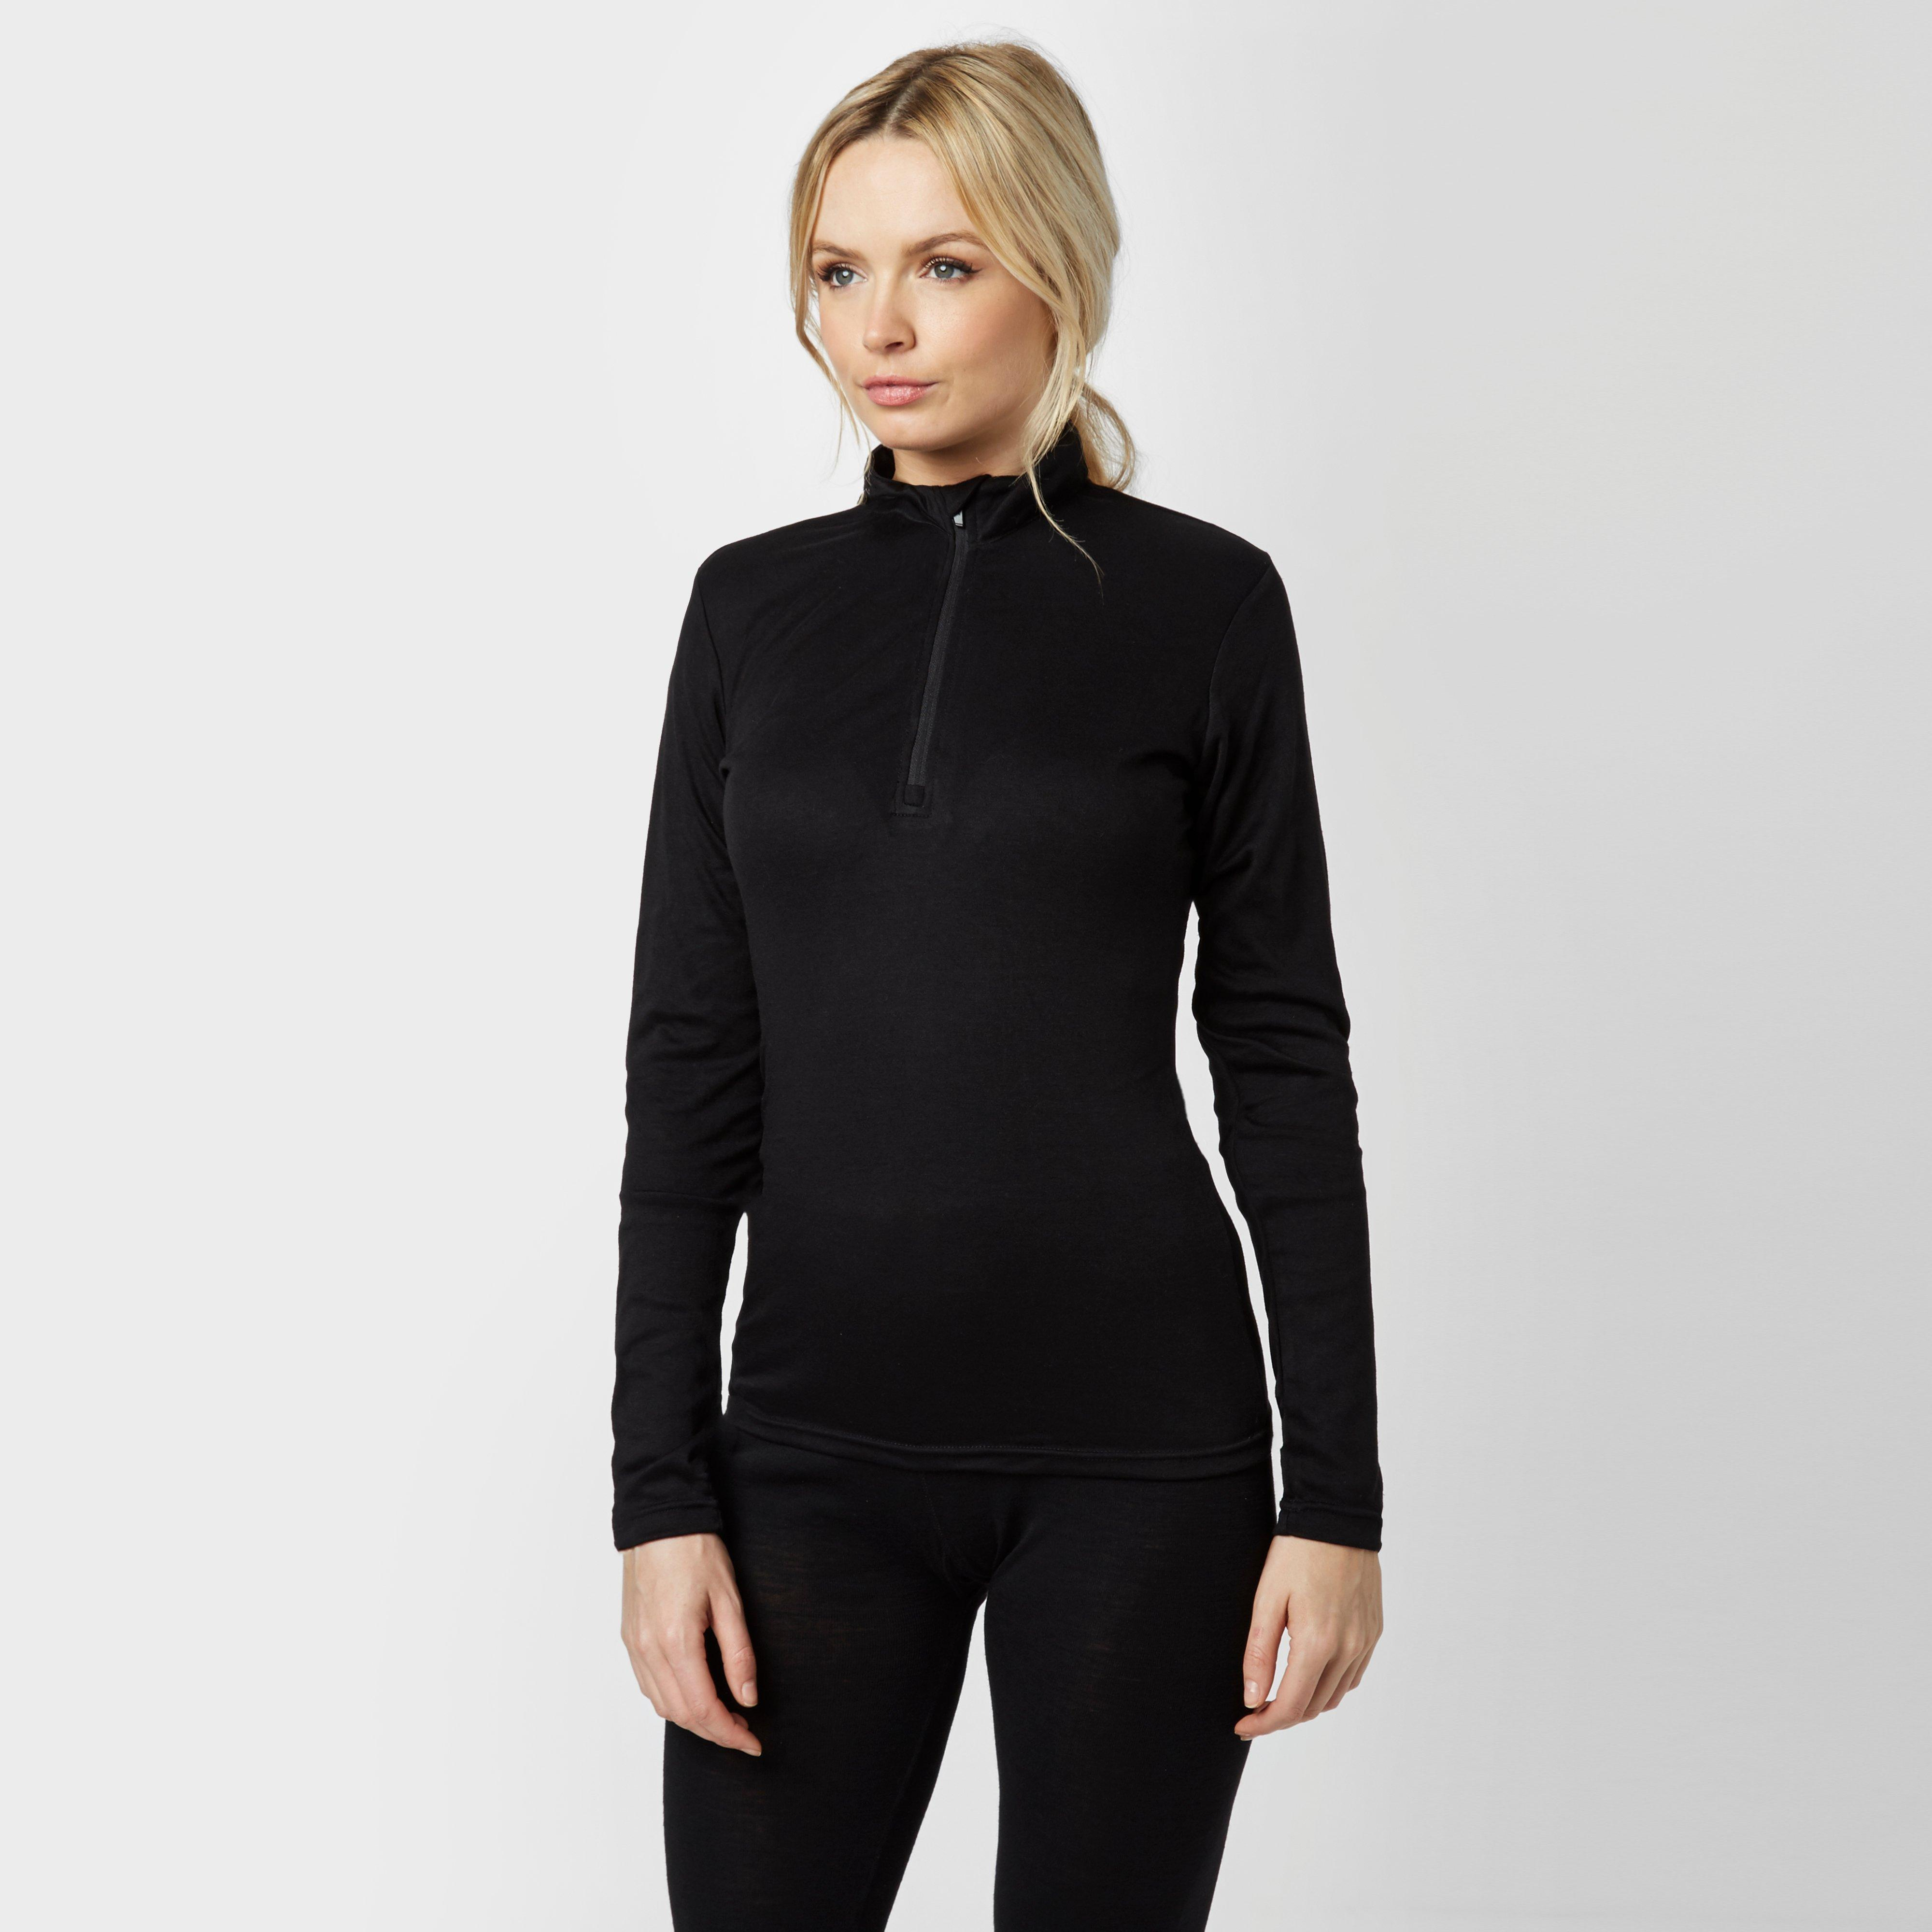 Image of Peter Storm Women's Long Sleeve Thermal Crew Baselayer - Black/Blk, Black/BLK